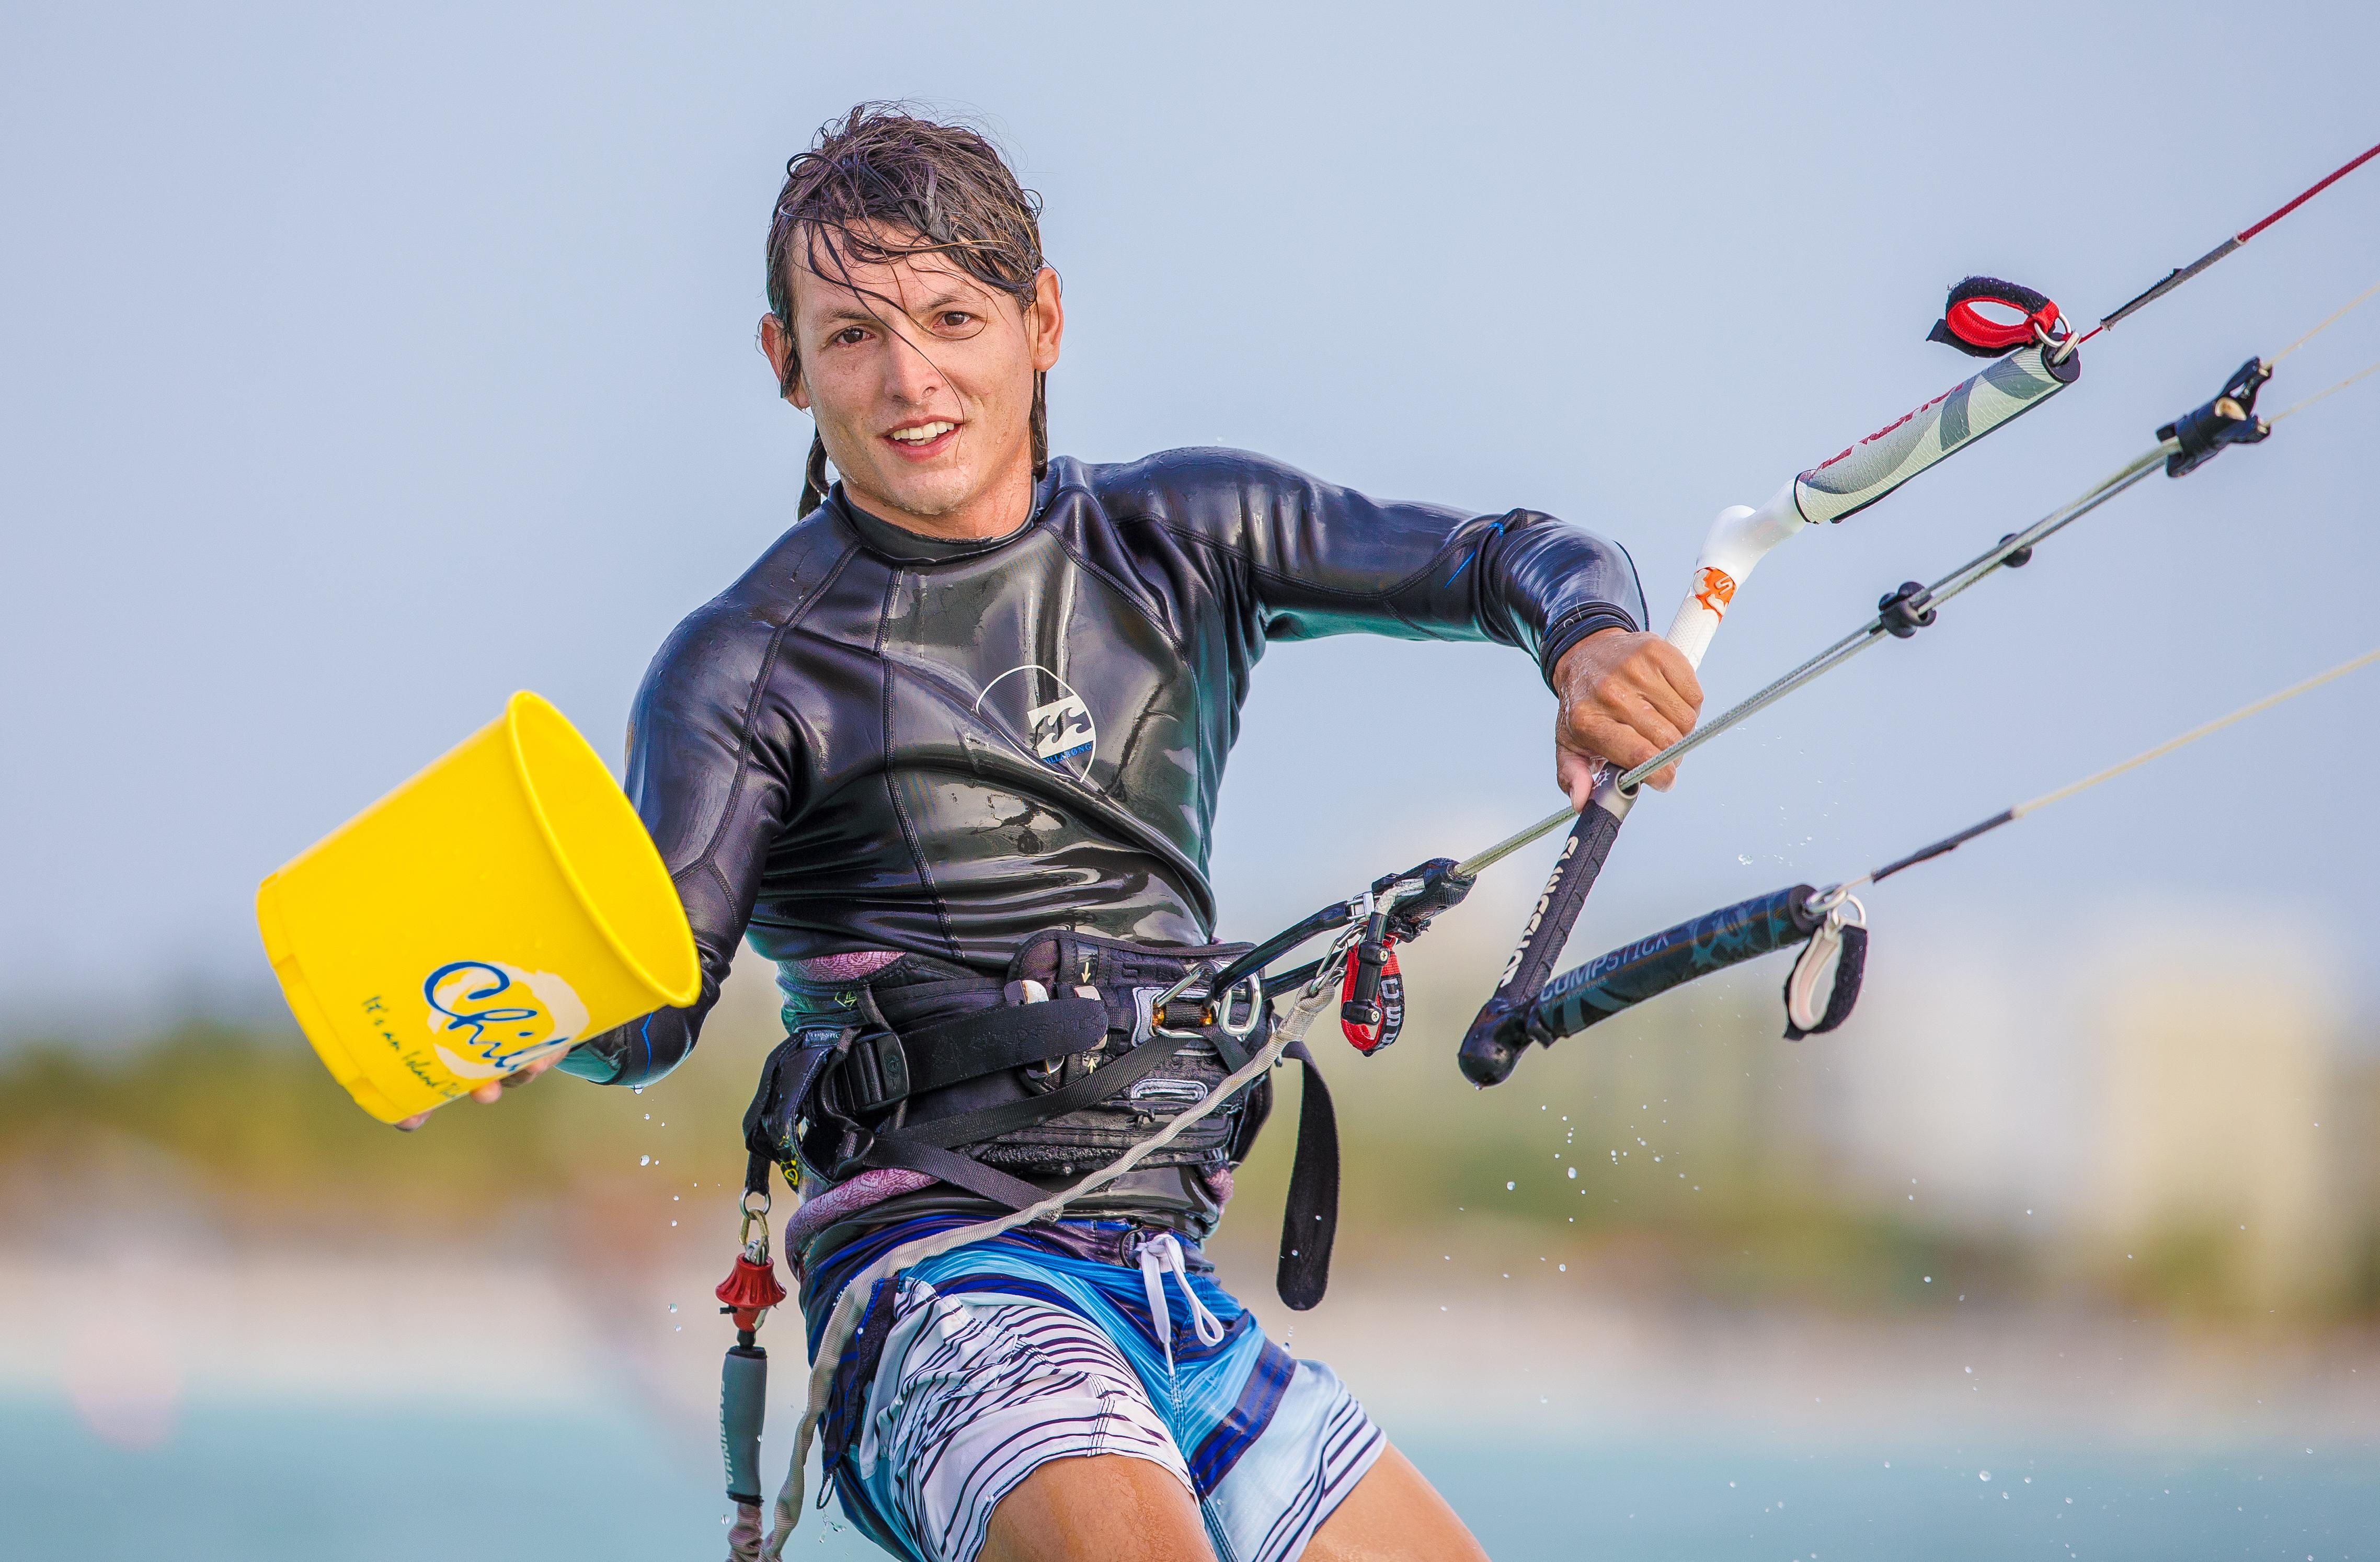 Andres Osorio Gonzalez Kitesurfing